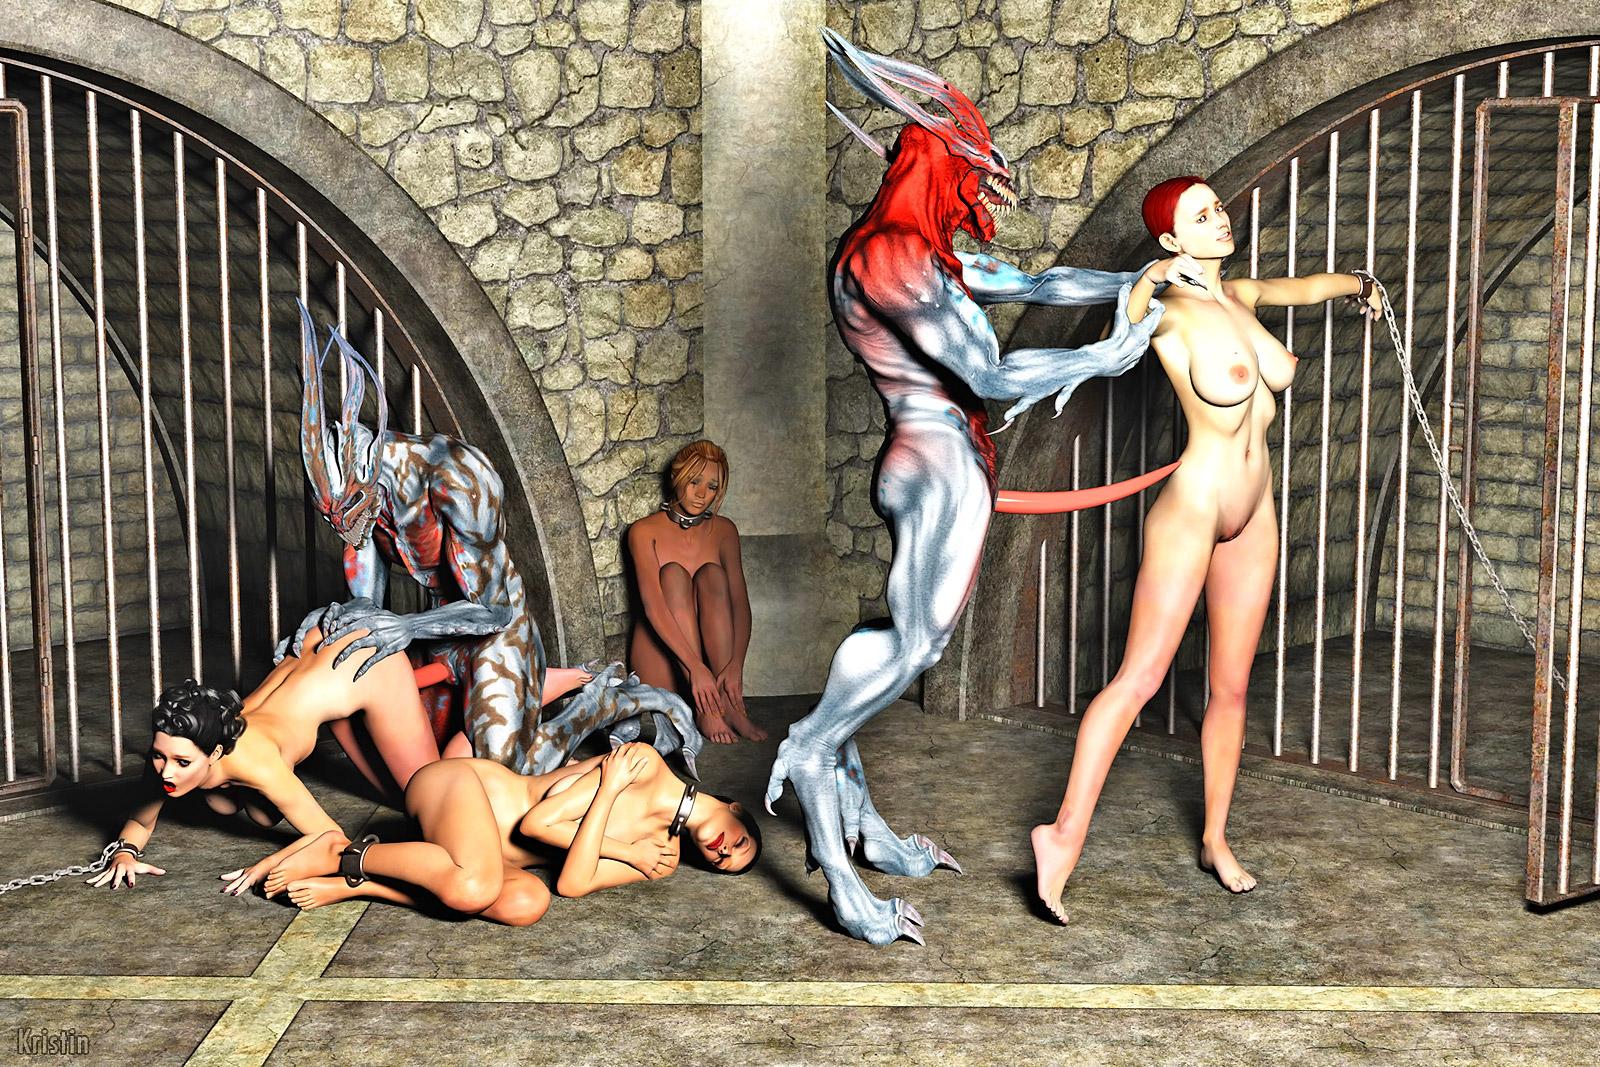 Sextoon galleries nude movies